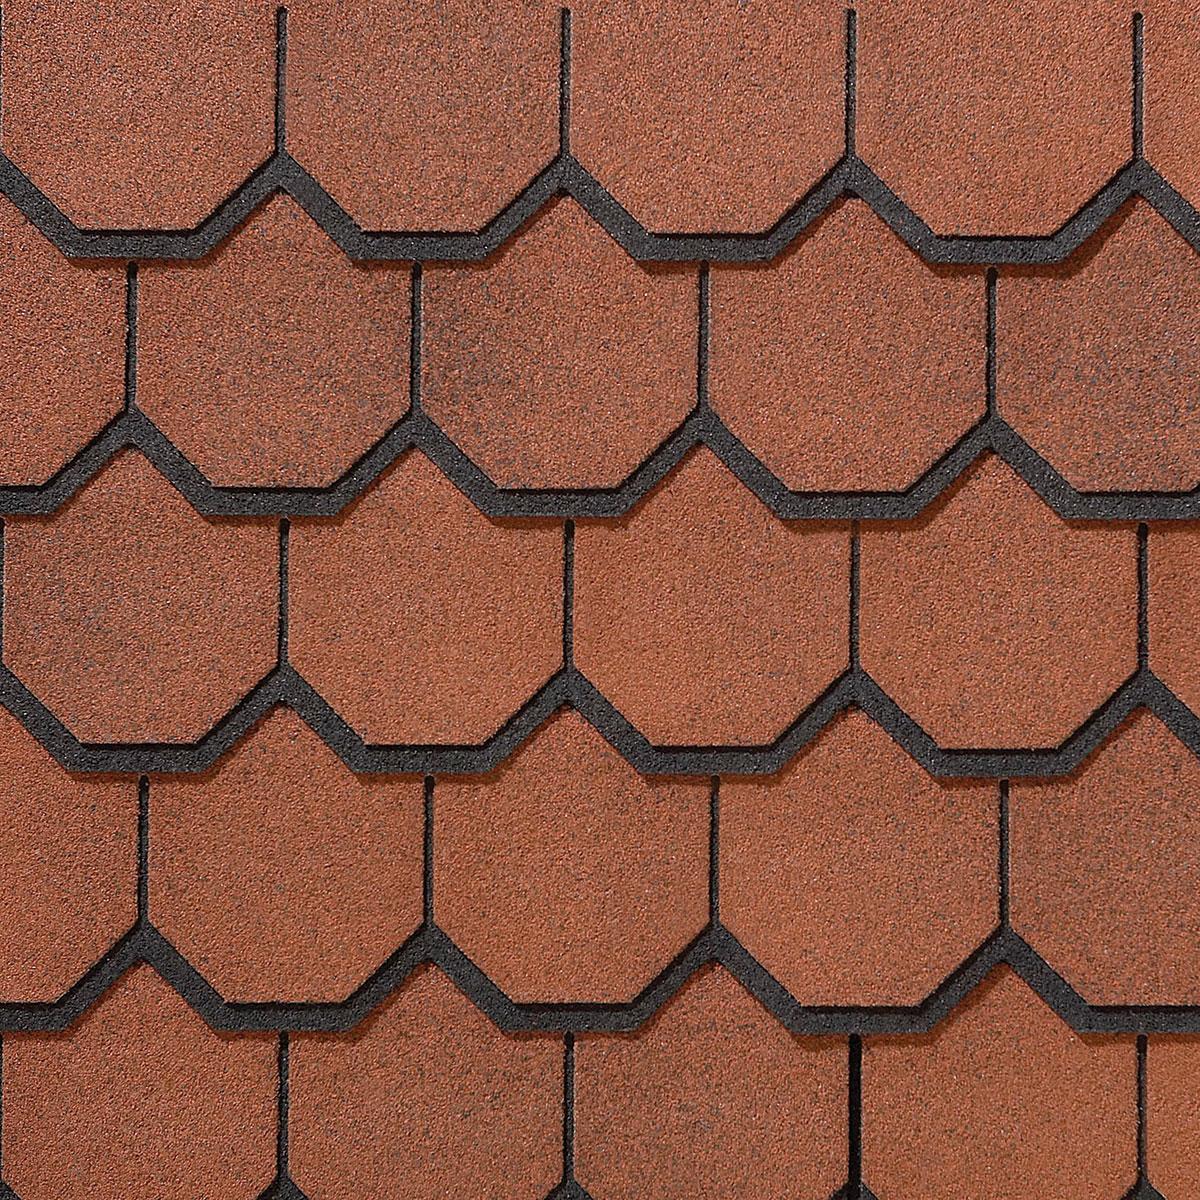 CT Carriage House Georgian Brick (CTCHGEBR) <br>5 Bdl/Sq